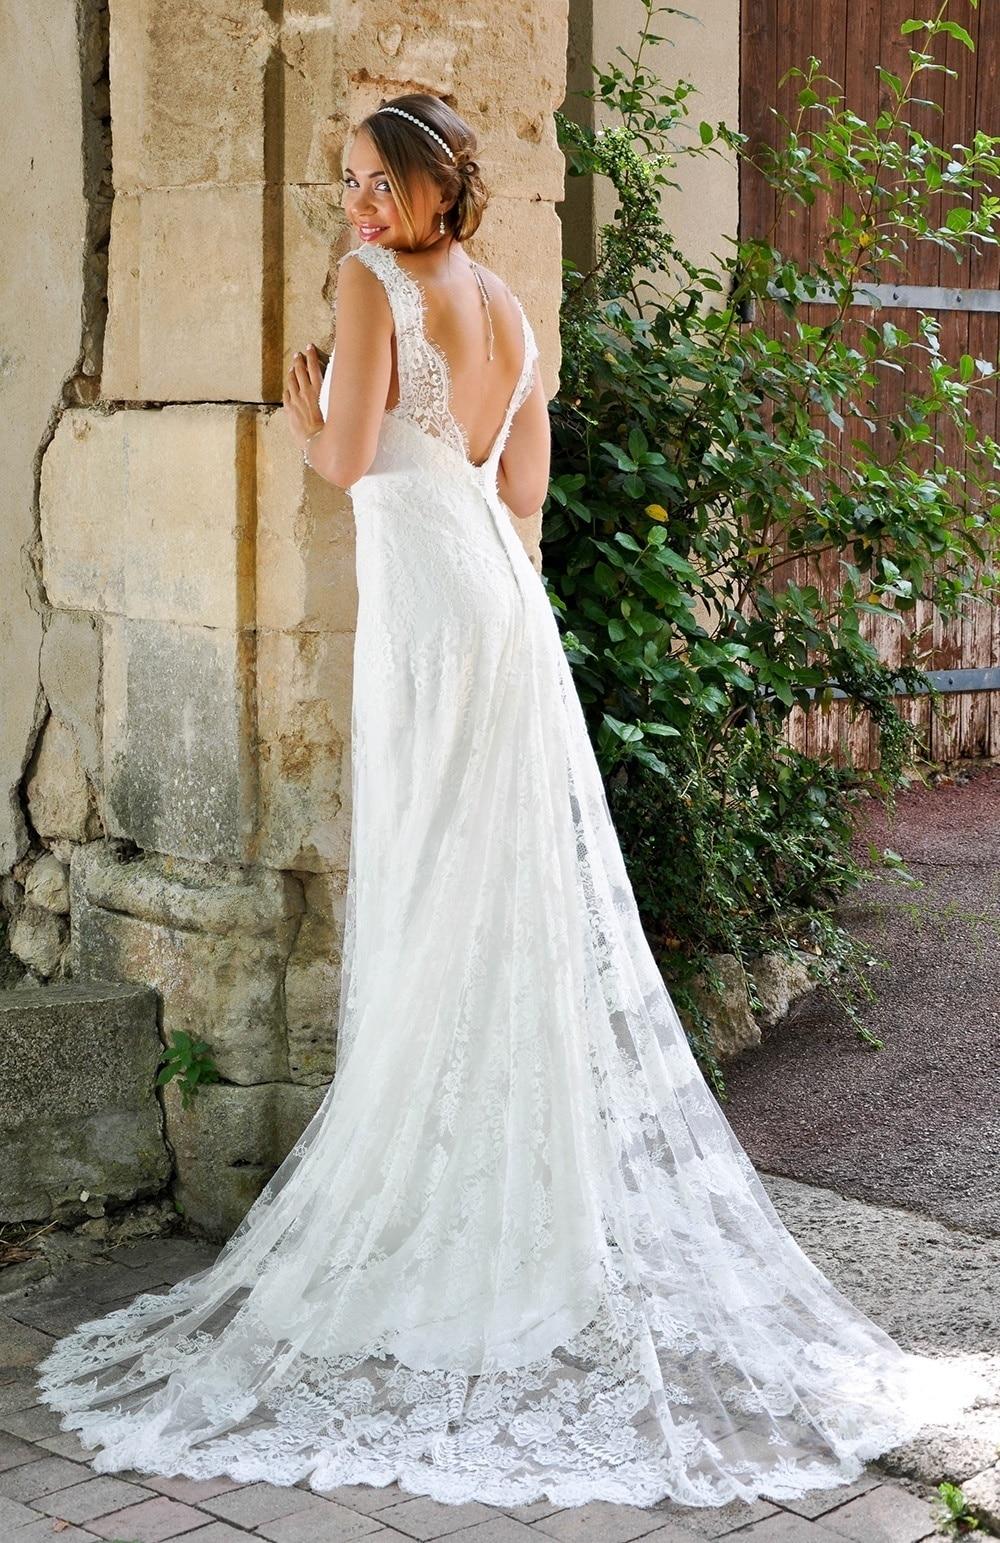 Robe de mariée Modèle Bonbon